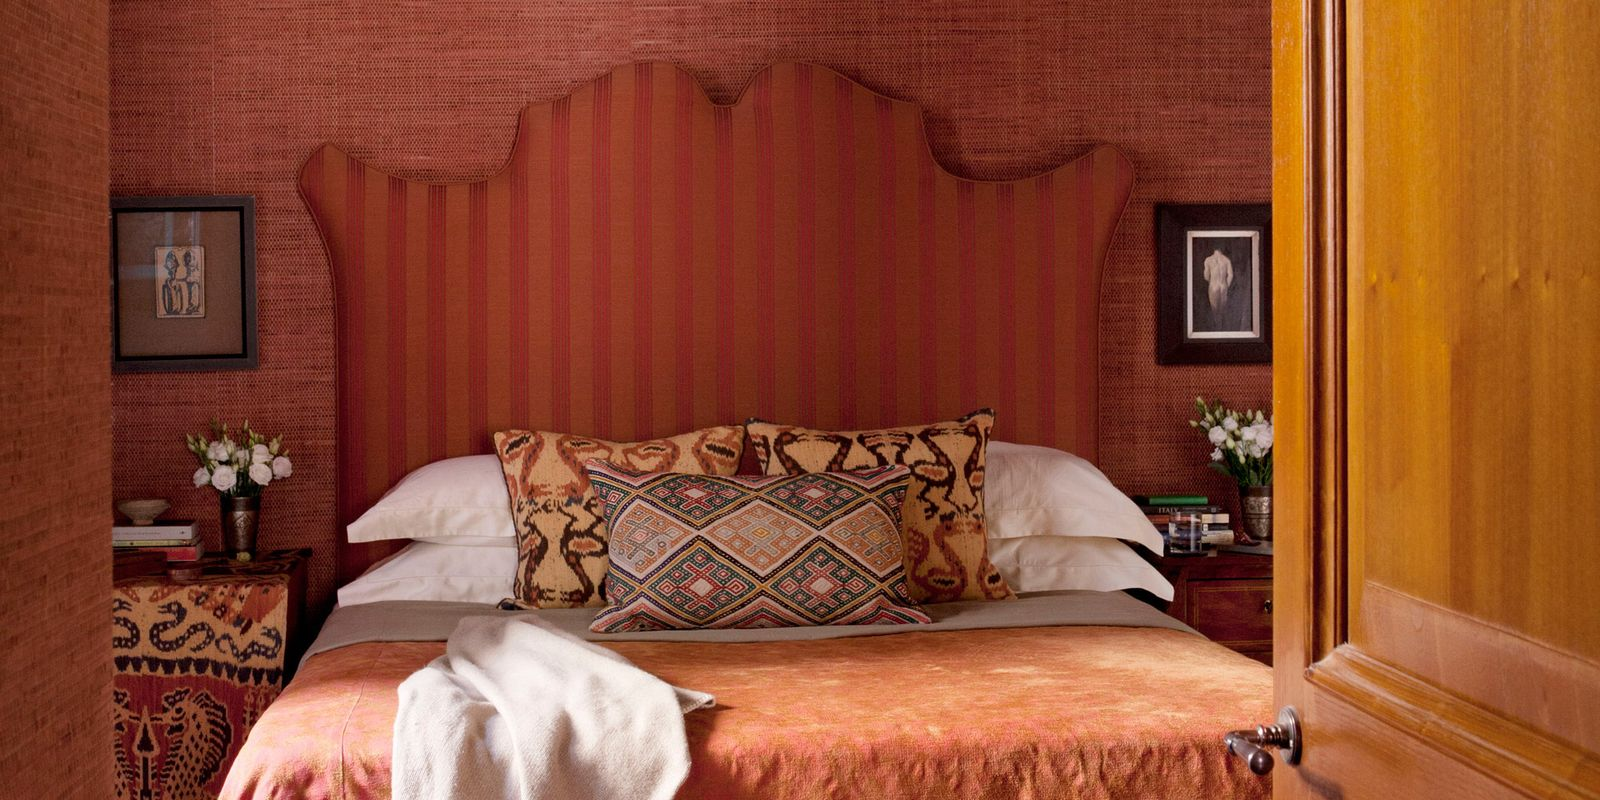 Marsala Color Rooms Marsala Pantone Color Of The Year 2015